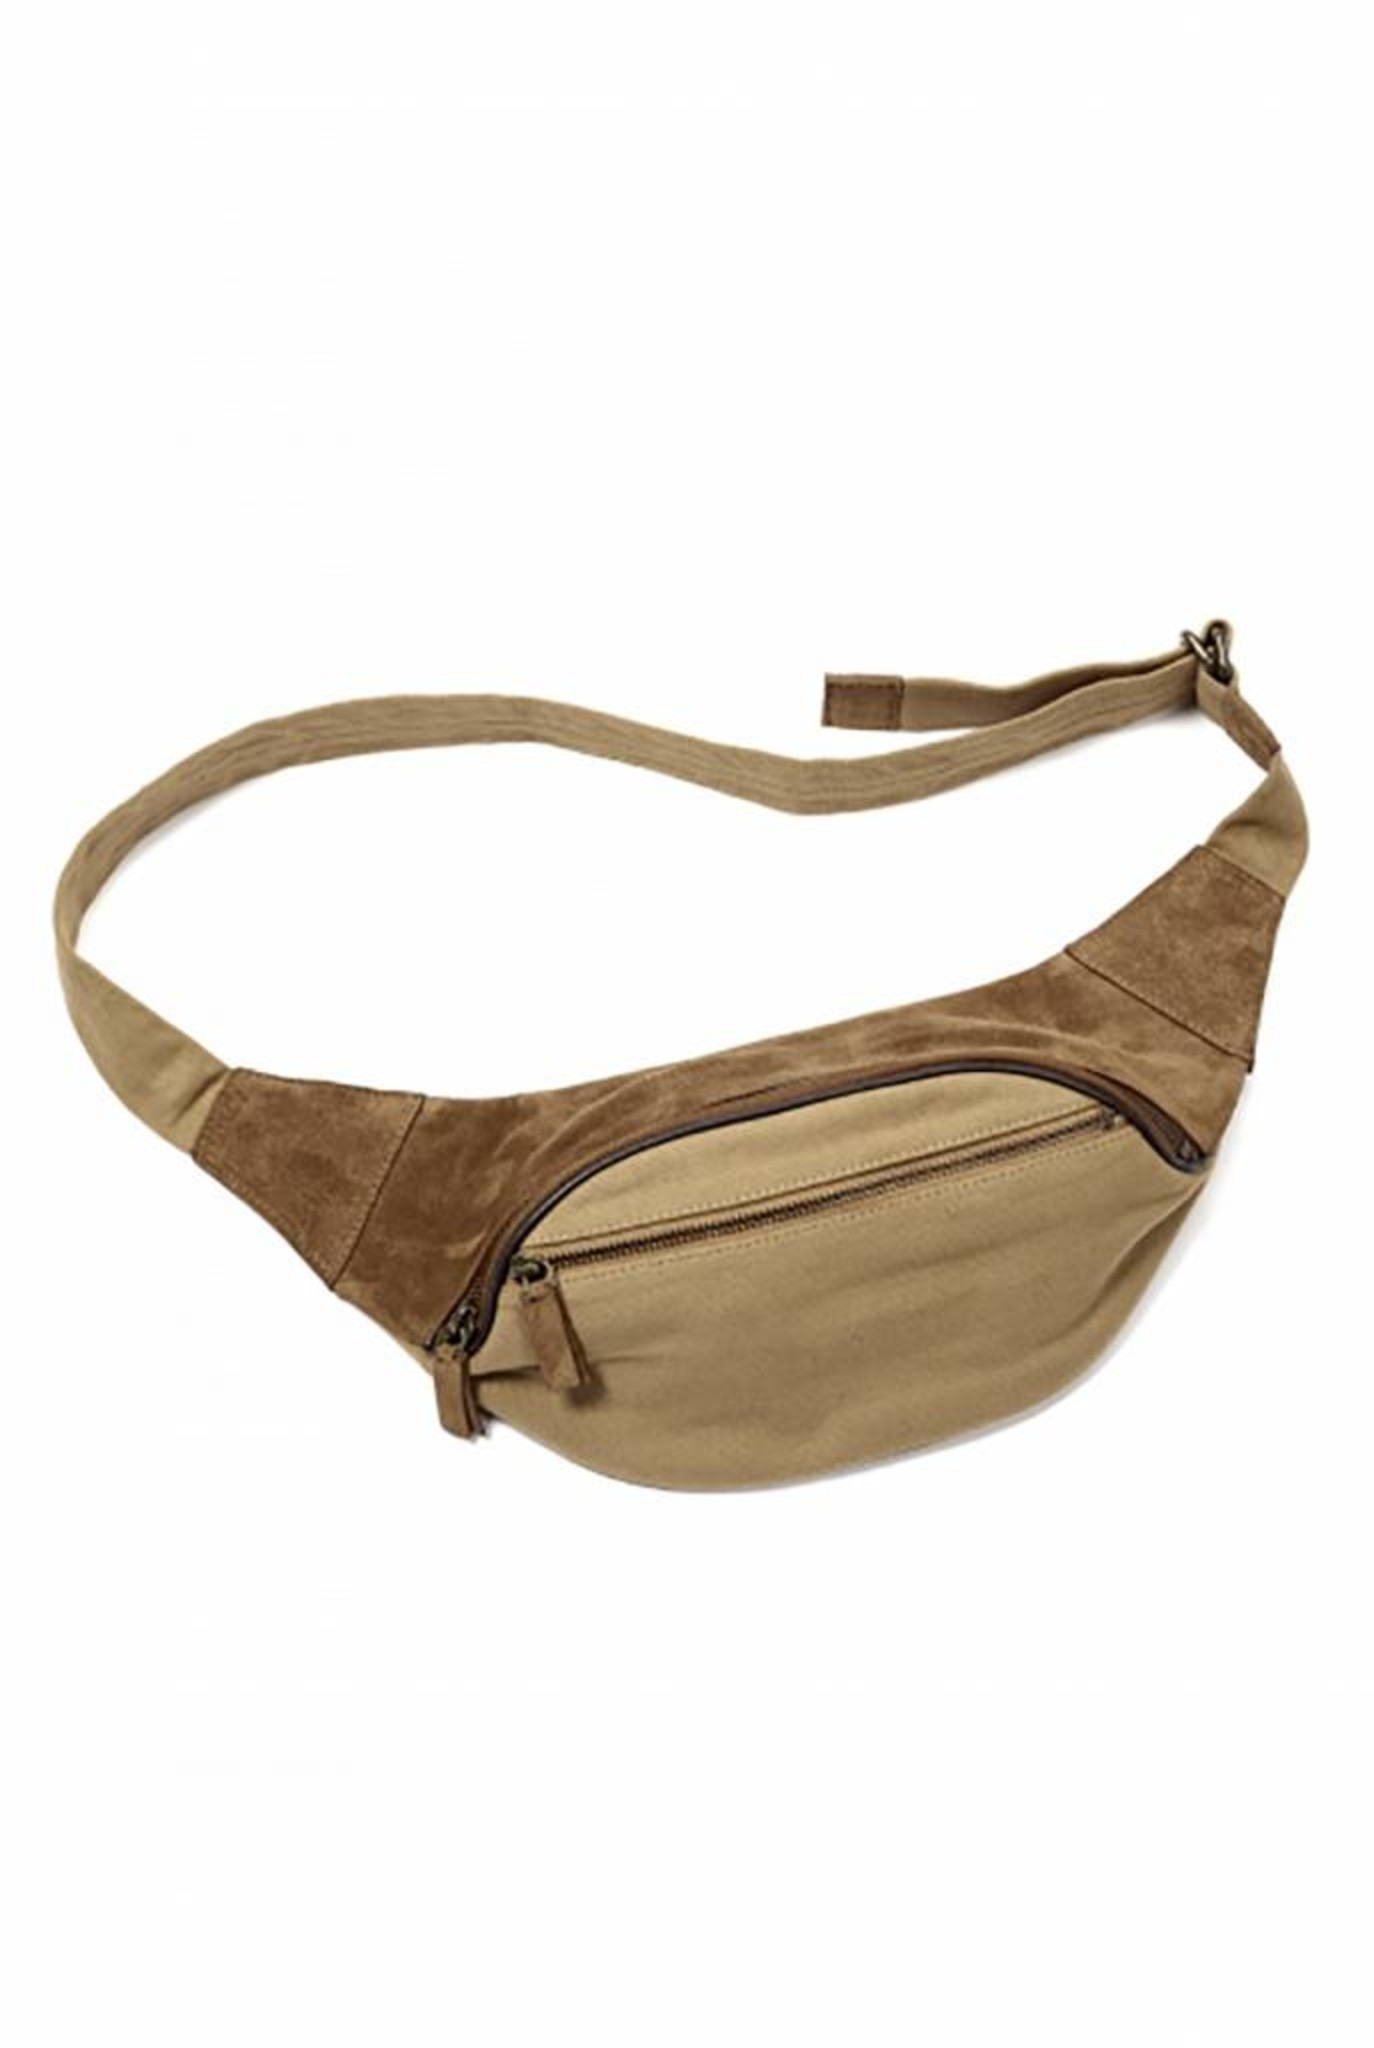 Waistbag brown